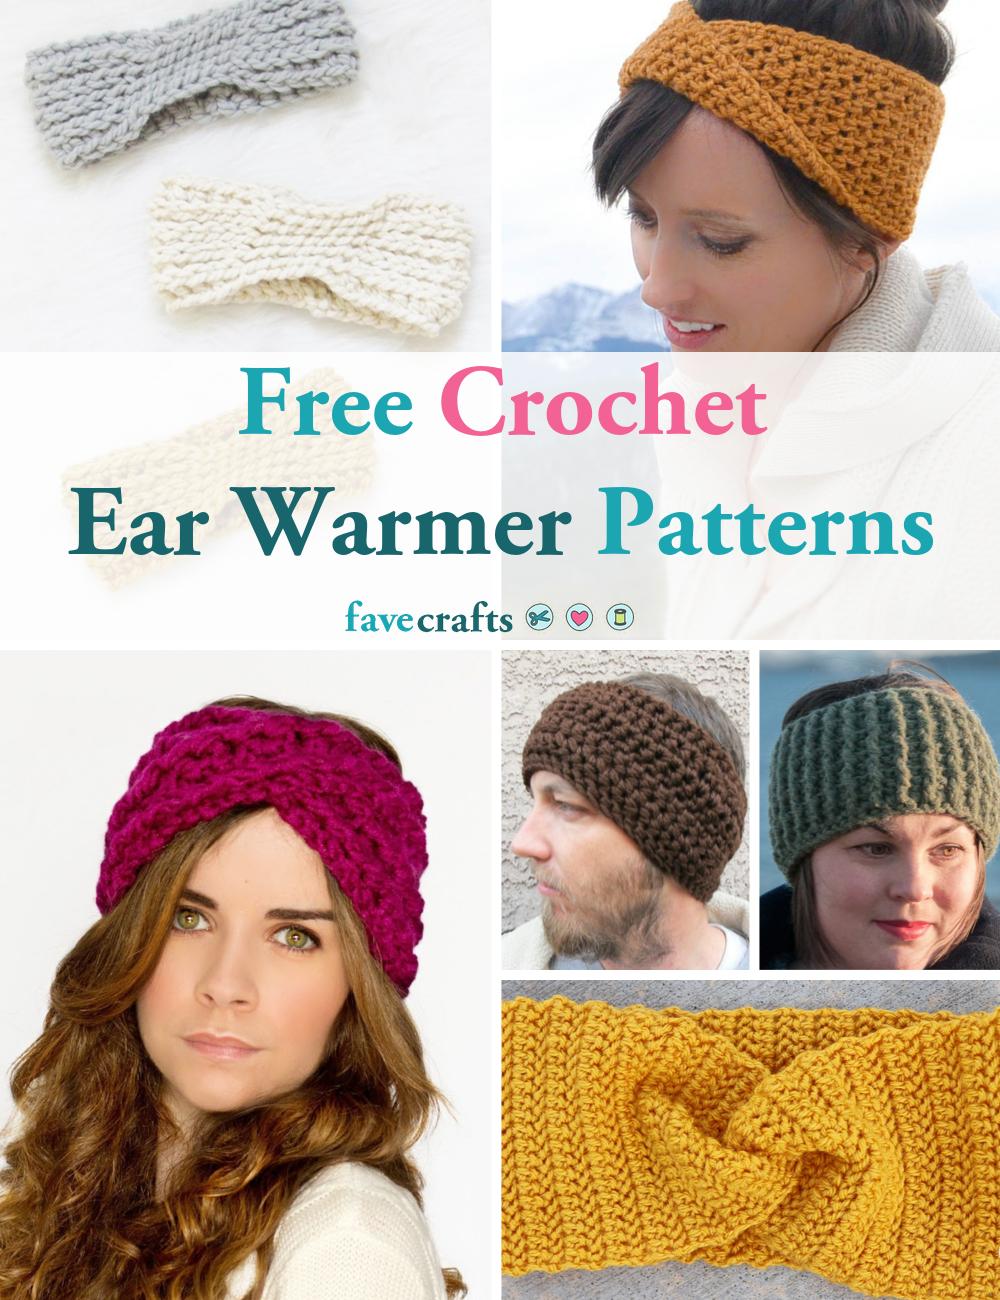 27 Free Crochet Ear Warmer Patterns Favecrafts Com